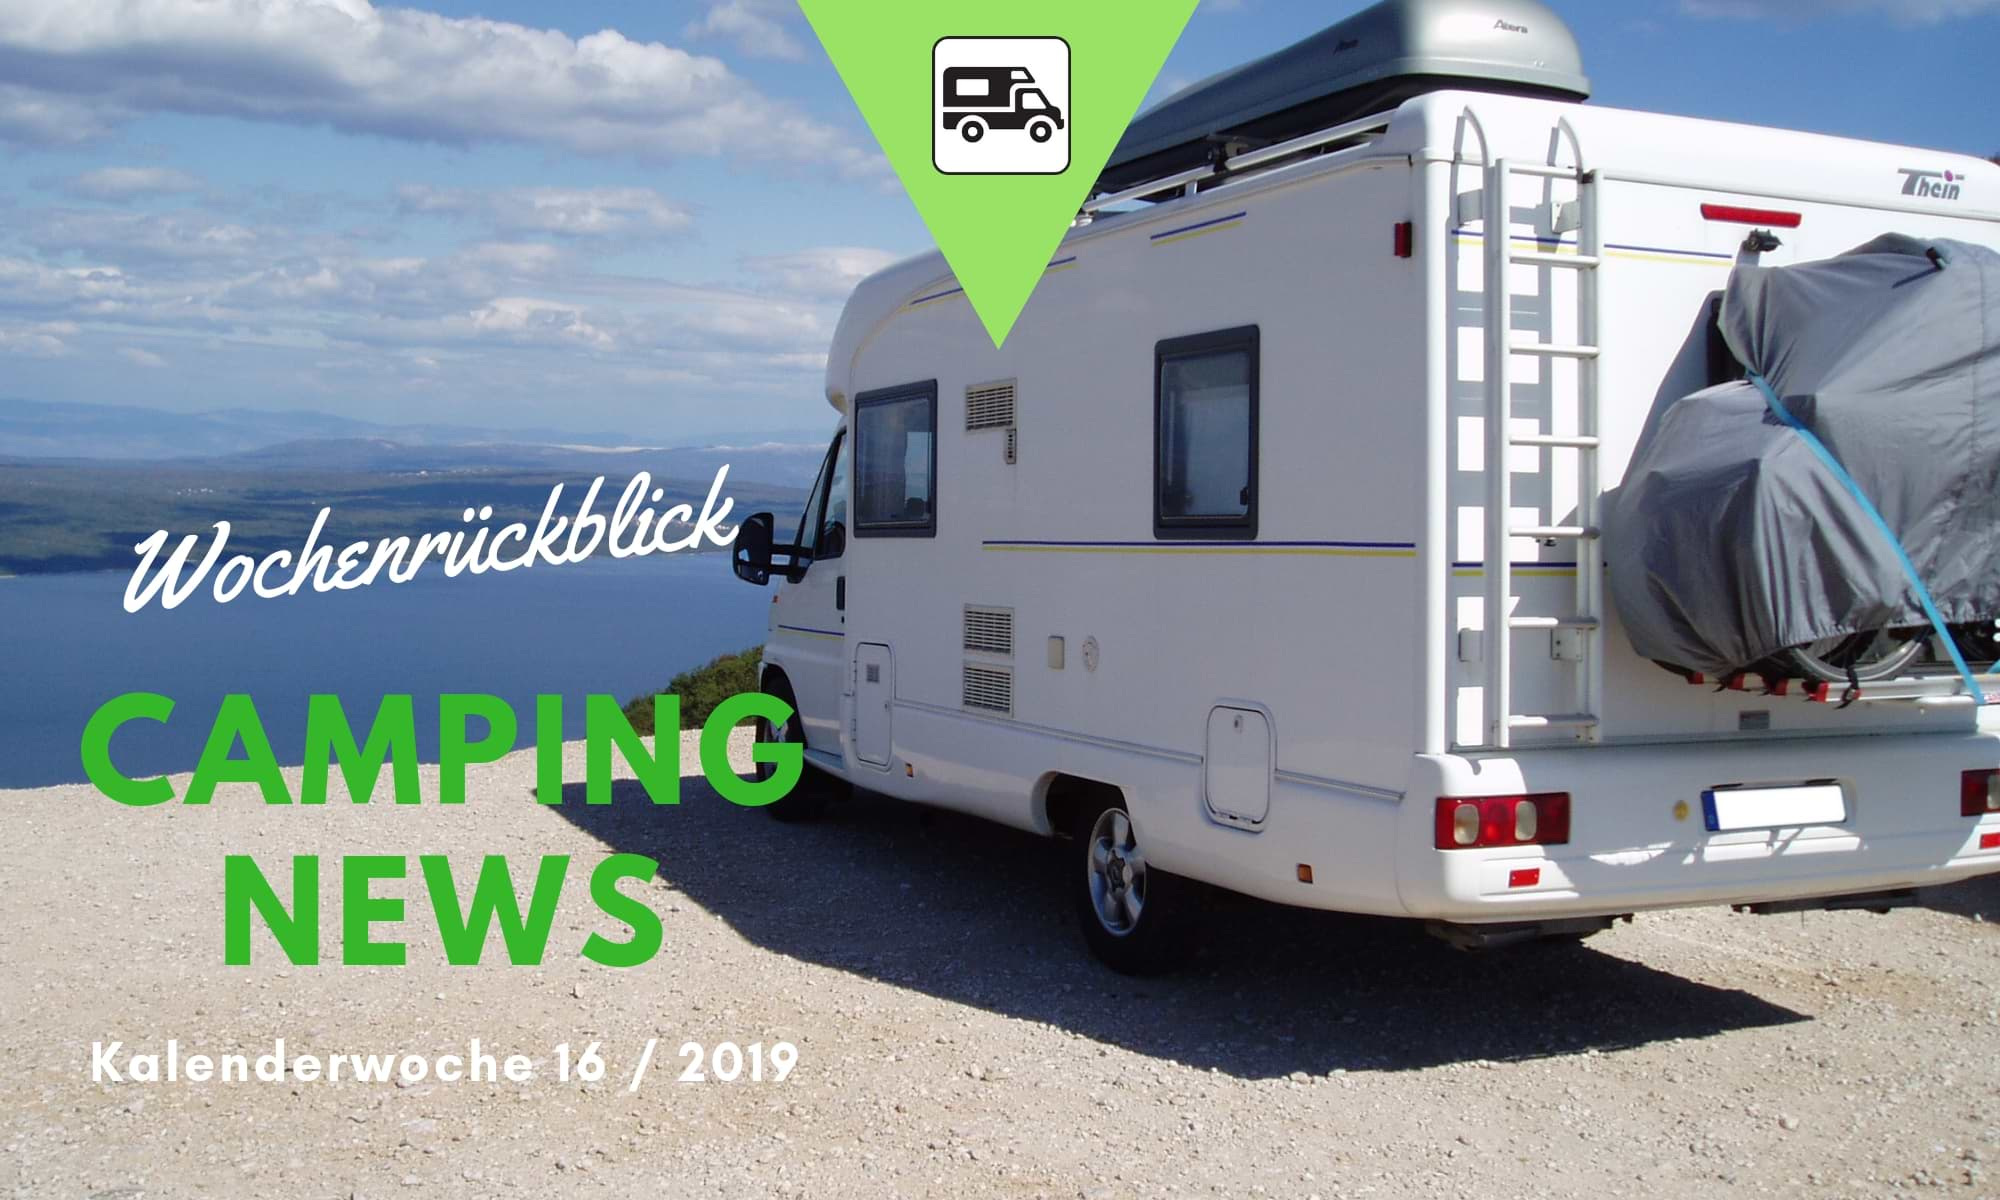 Wochenrückblick Camping News KW16-2019